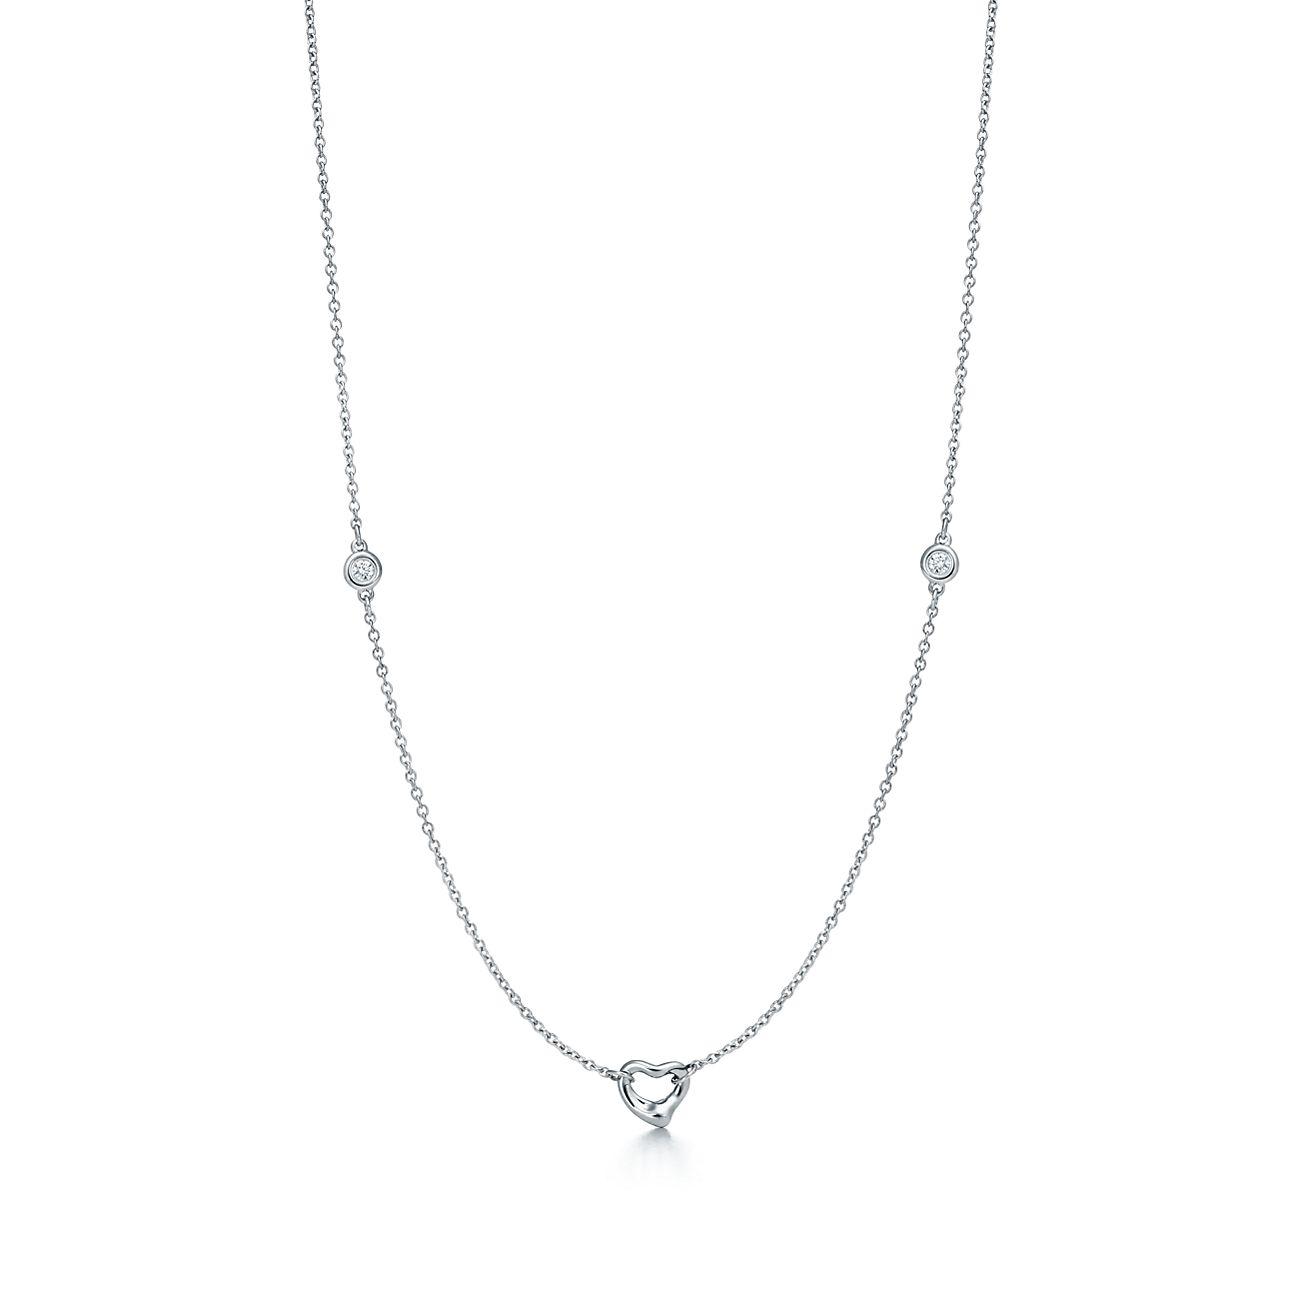 Elsa Peretti Diamonds by the Yard Open Heart pendant in sterling silver Tiffany & Co. at6QjFGO